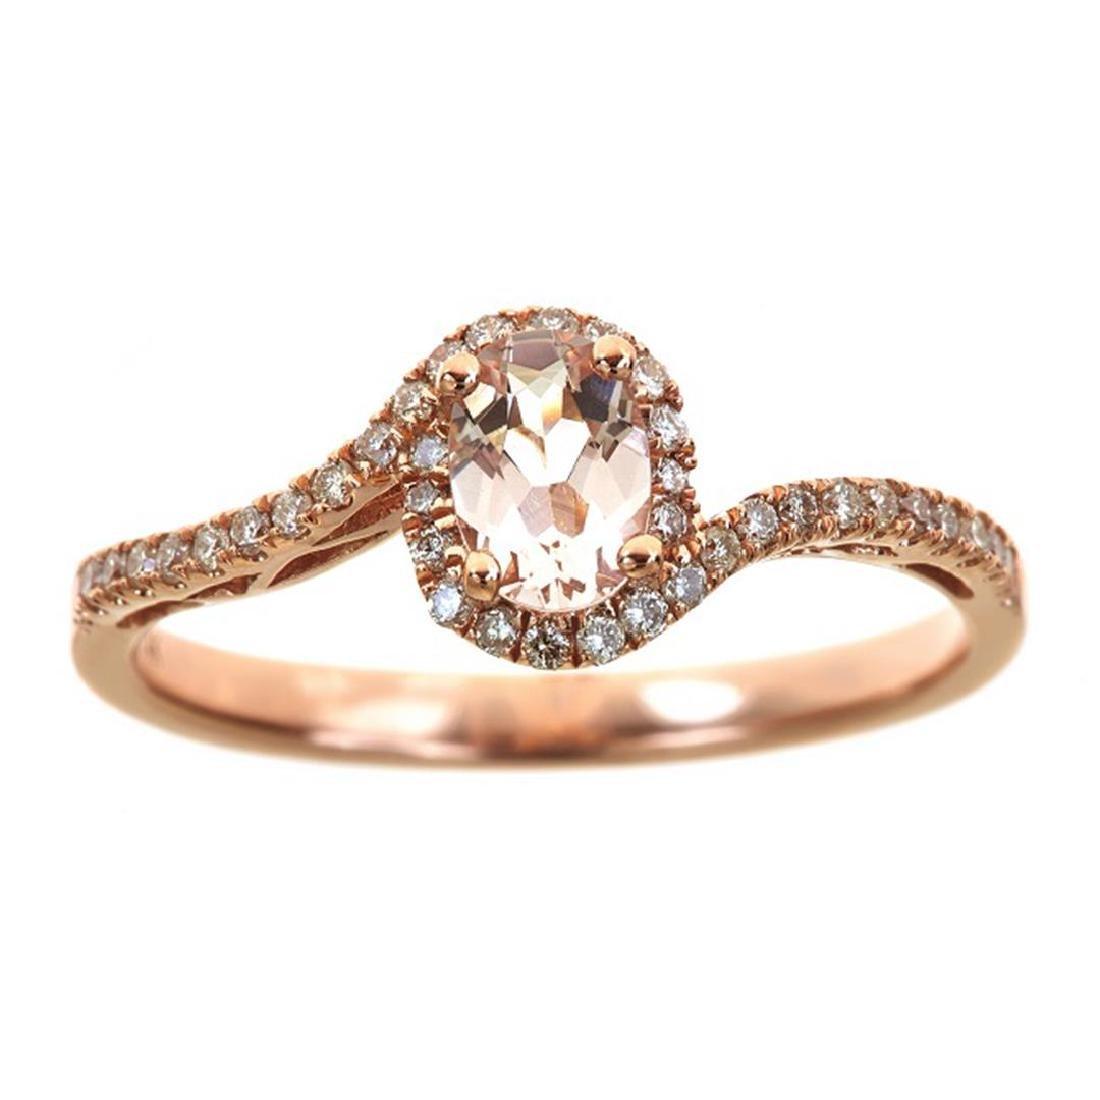 0.48 ctw Morganite and Diamond Ring - 14KT Rose Gold